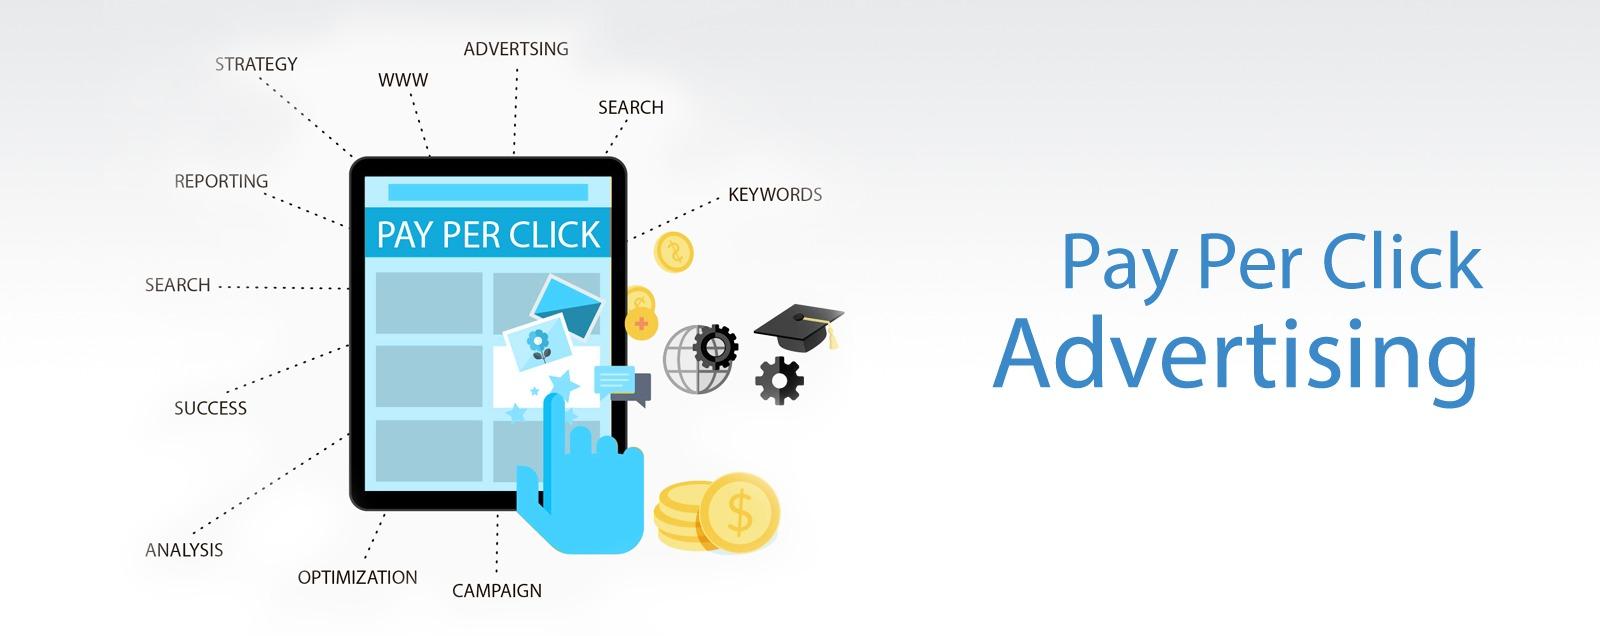 PPC advertising marketing destiny marketing solutions